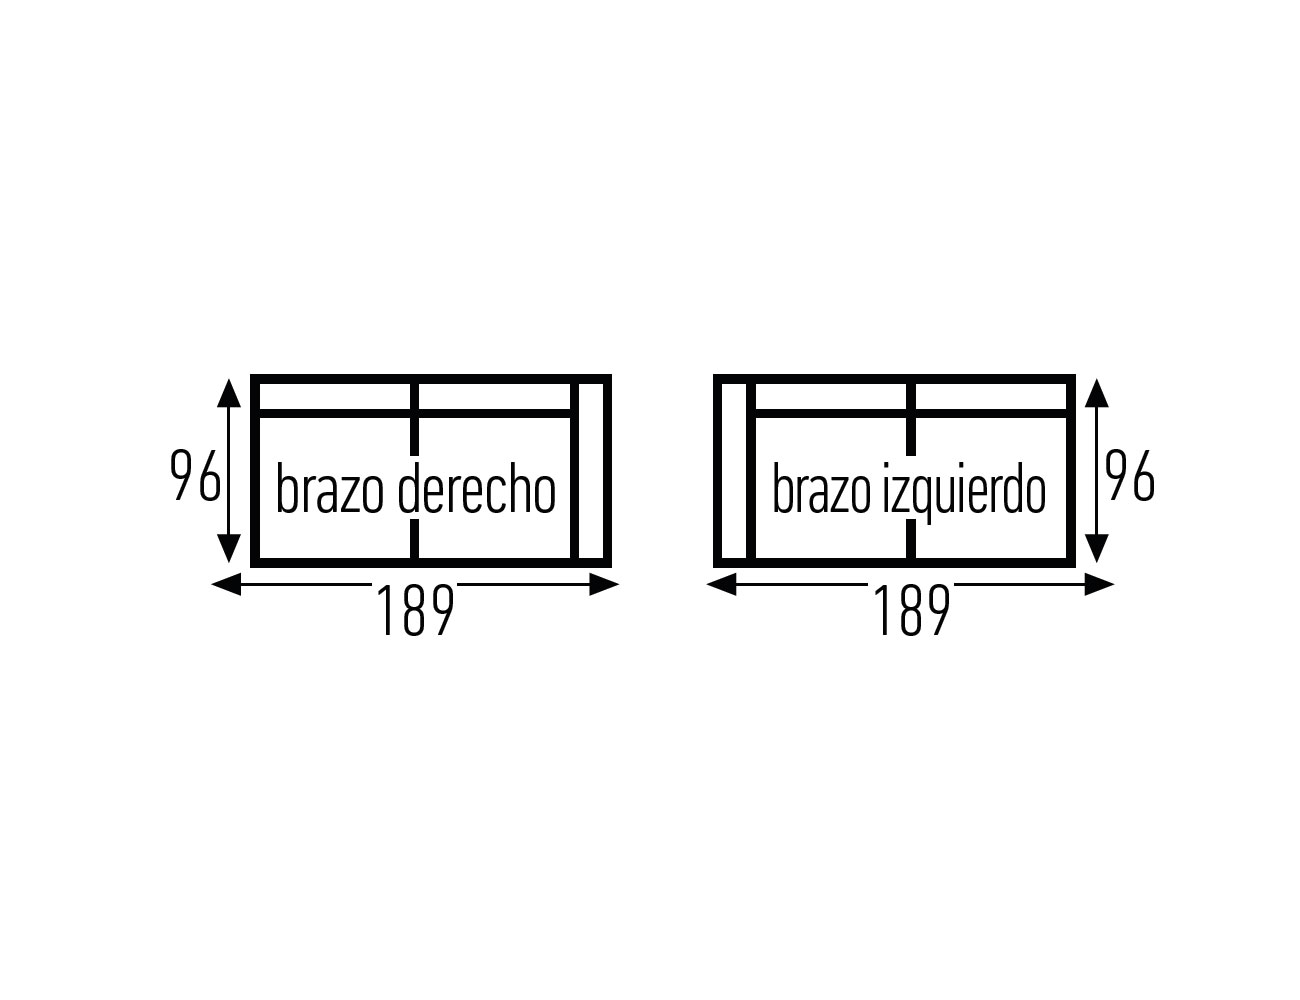 Croquis 3p sin 1 brazo 18919